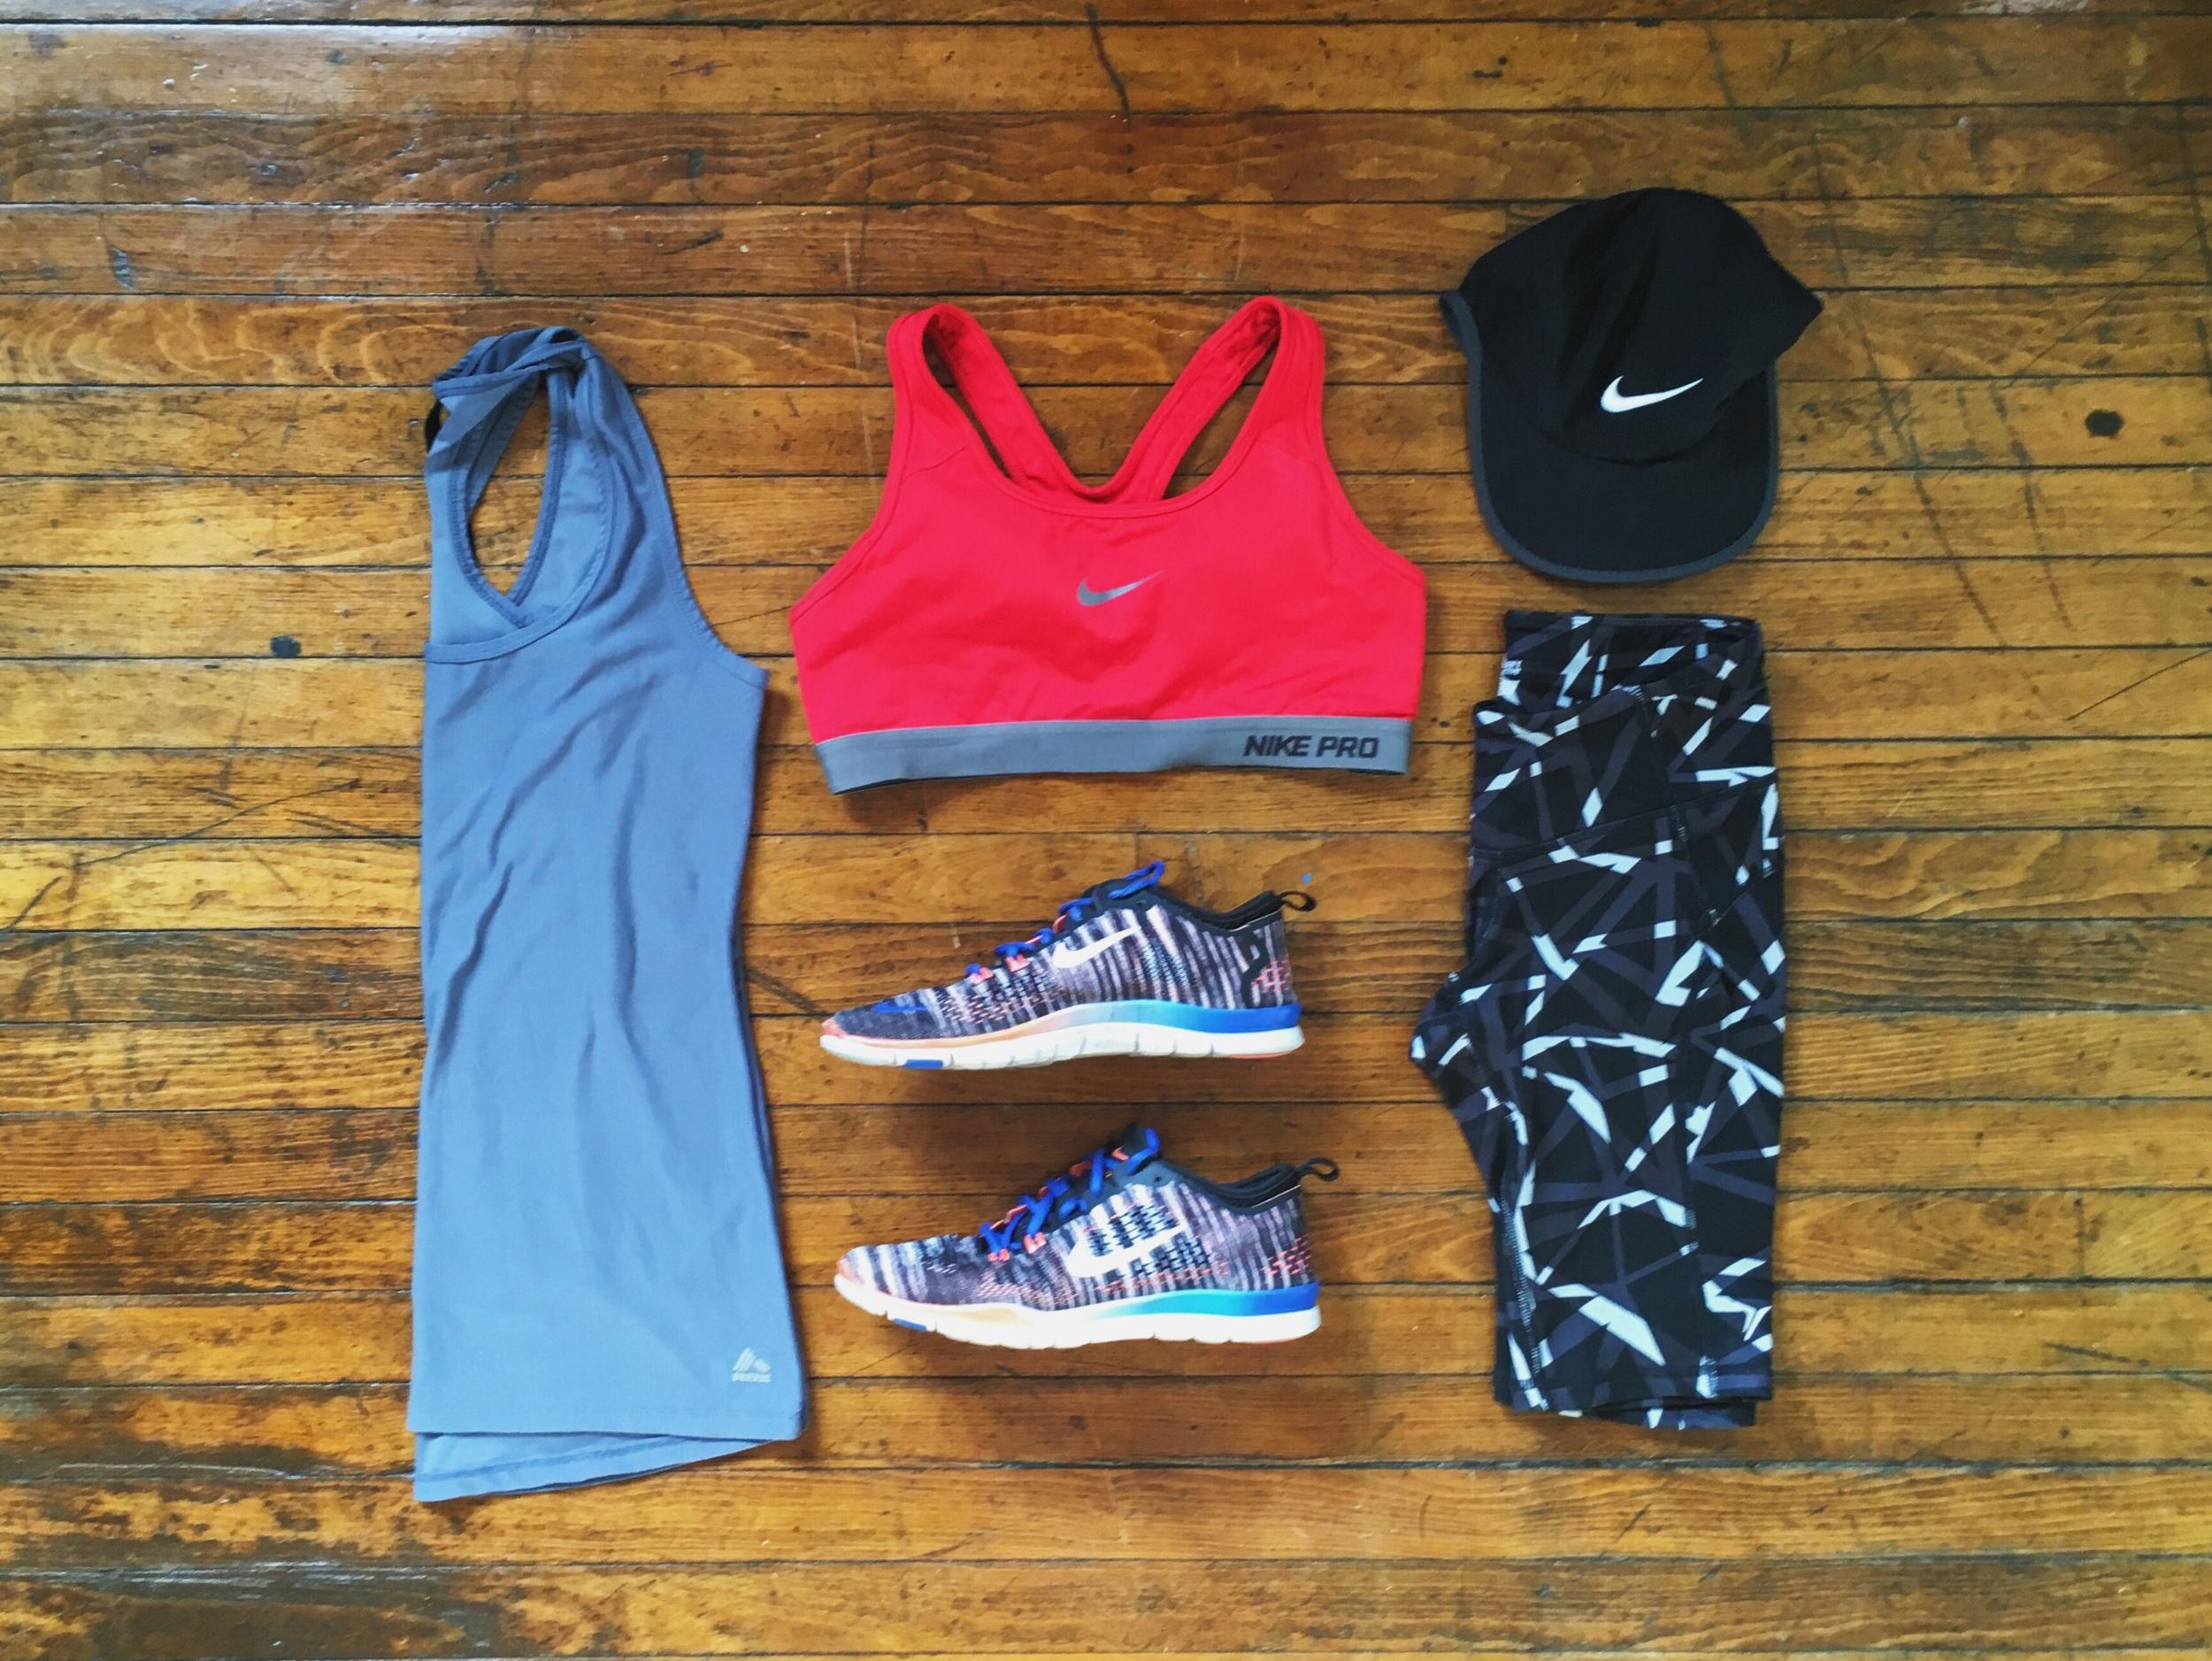 (1) Tank: RBX (2) Sports Bra:Nike (3) Shoes:Nike (4) Hat:Nike (5) Shorts: Old Navy